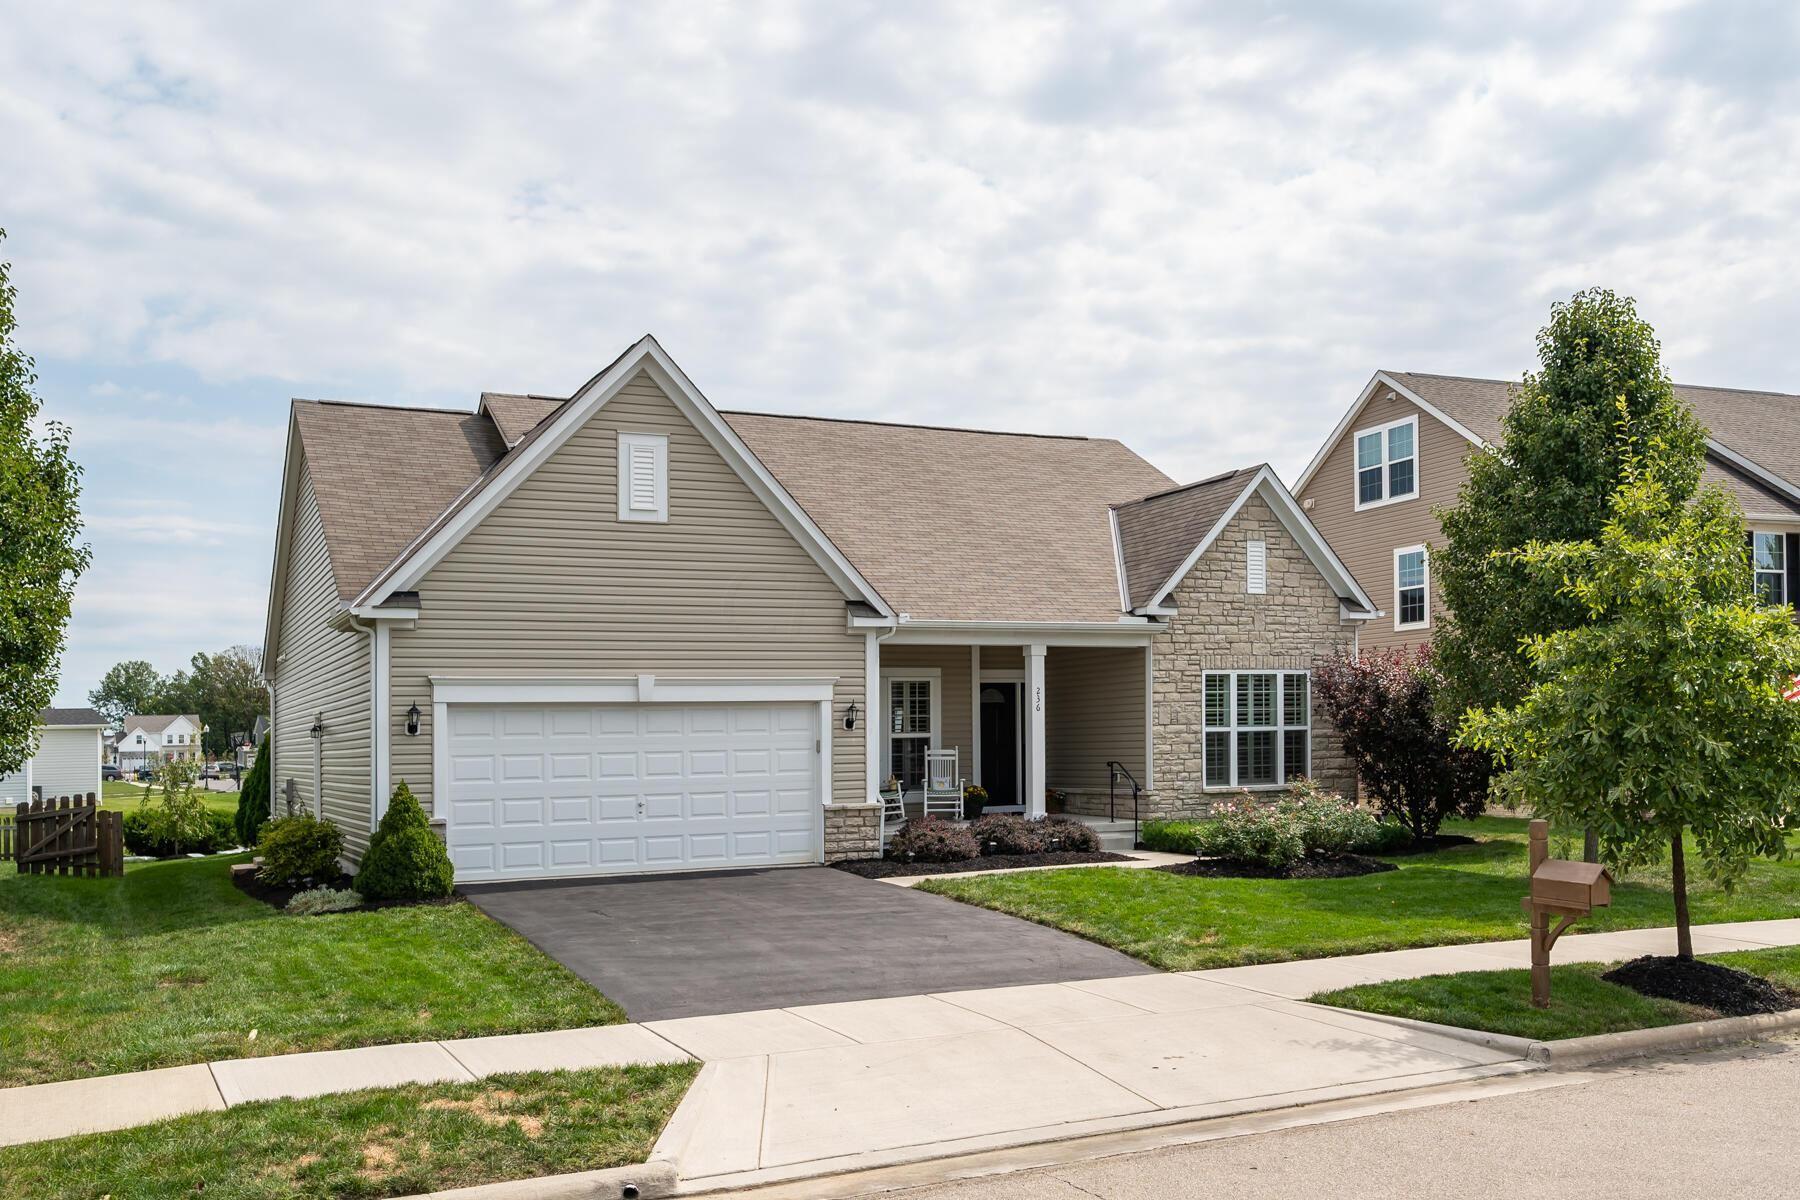 Photo of 236 Harmony Drive, Delaware, OH 43015 (MLS # 221035469)